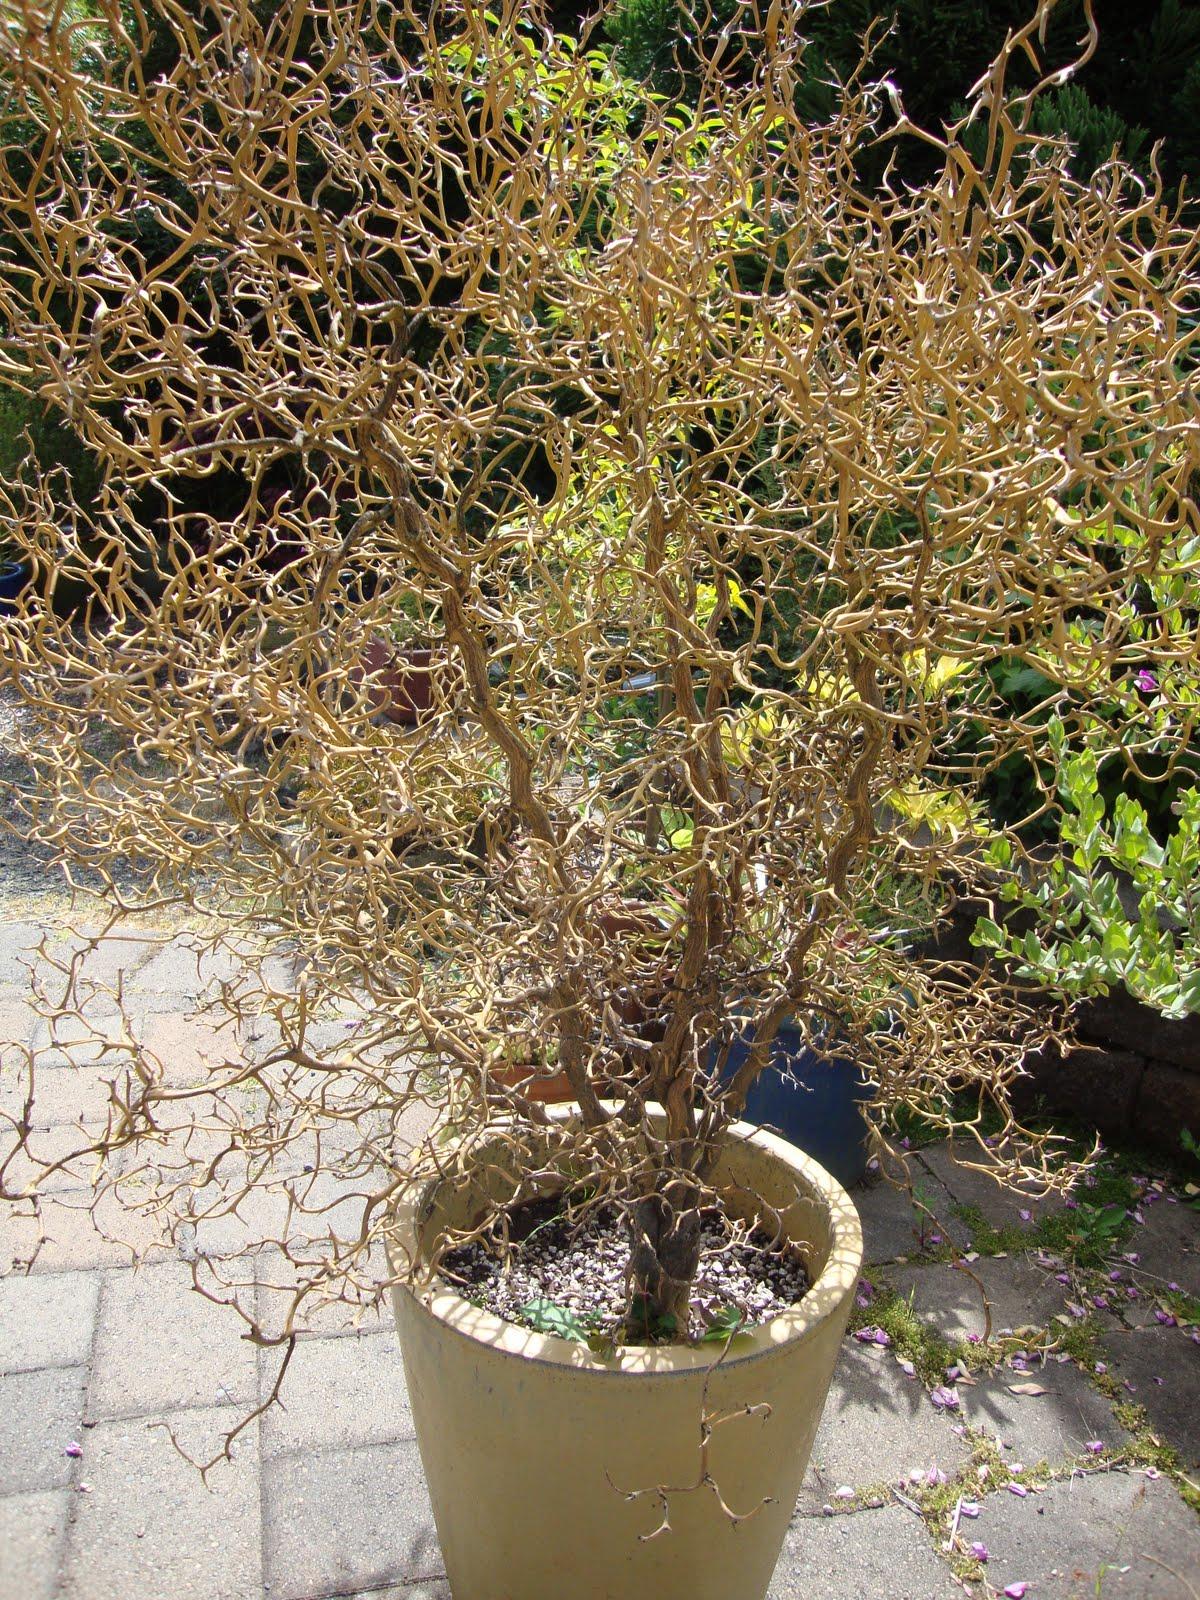 danger garden: Poncirus trifoliata, or Flying Dragon